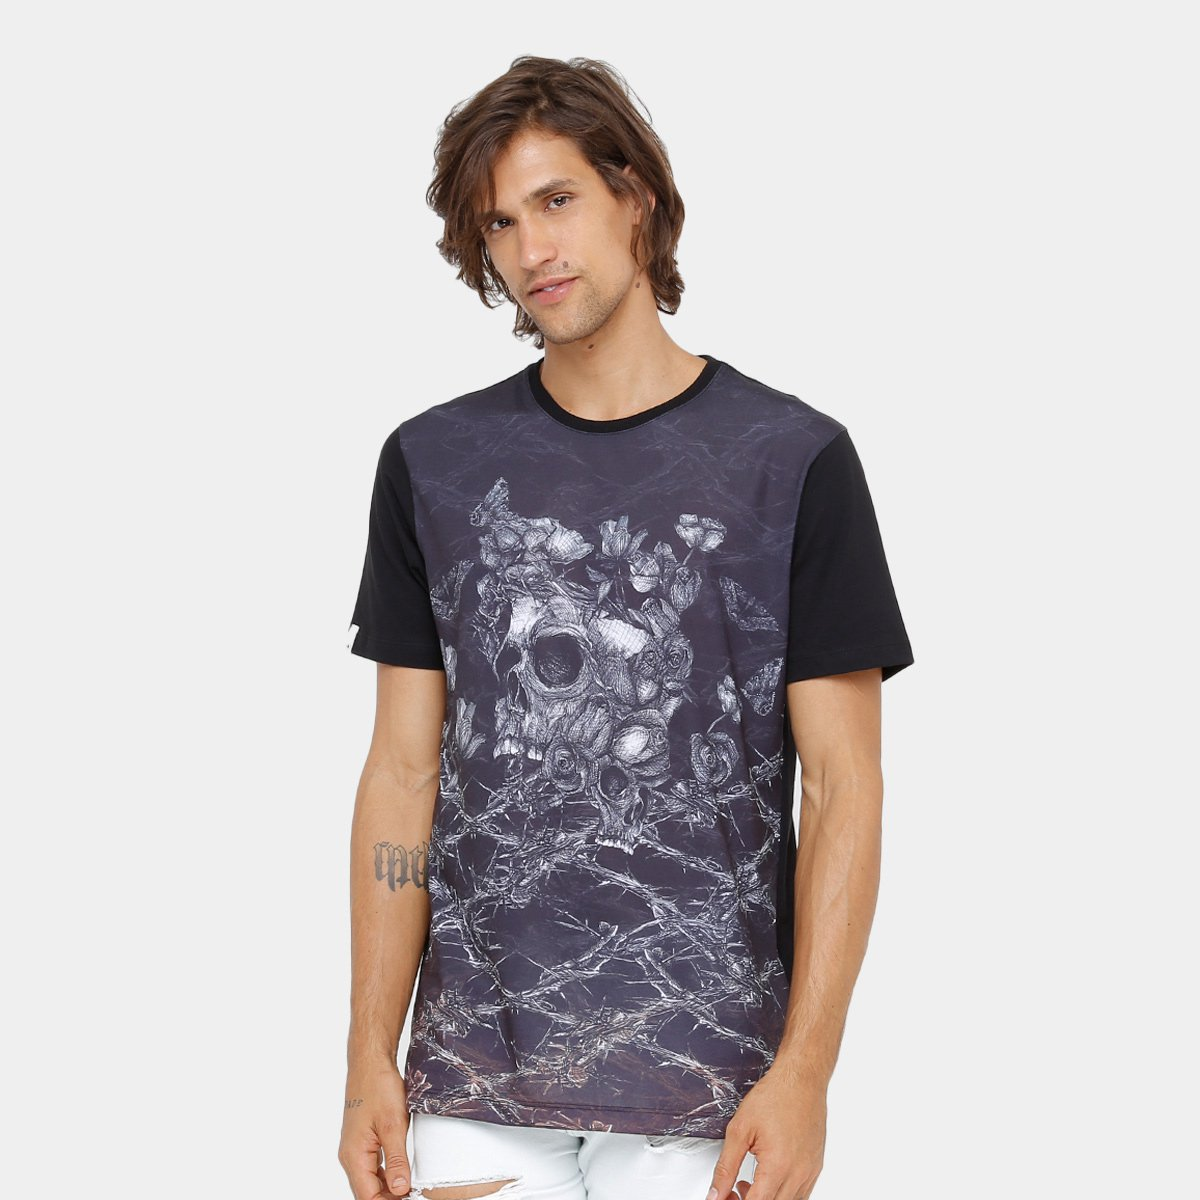 355ce5b17ea77 Camiseta MCD Especial Thorns Masculina - Compre Agora